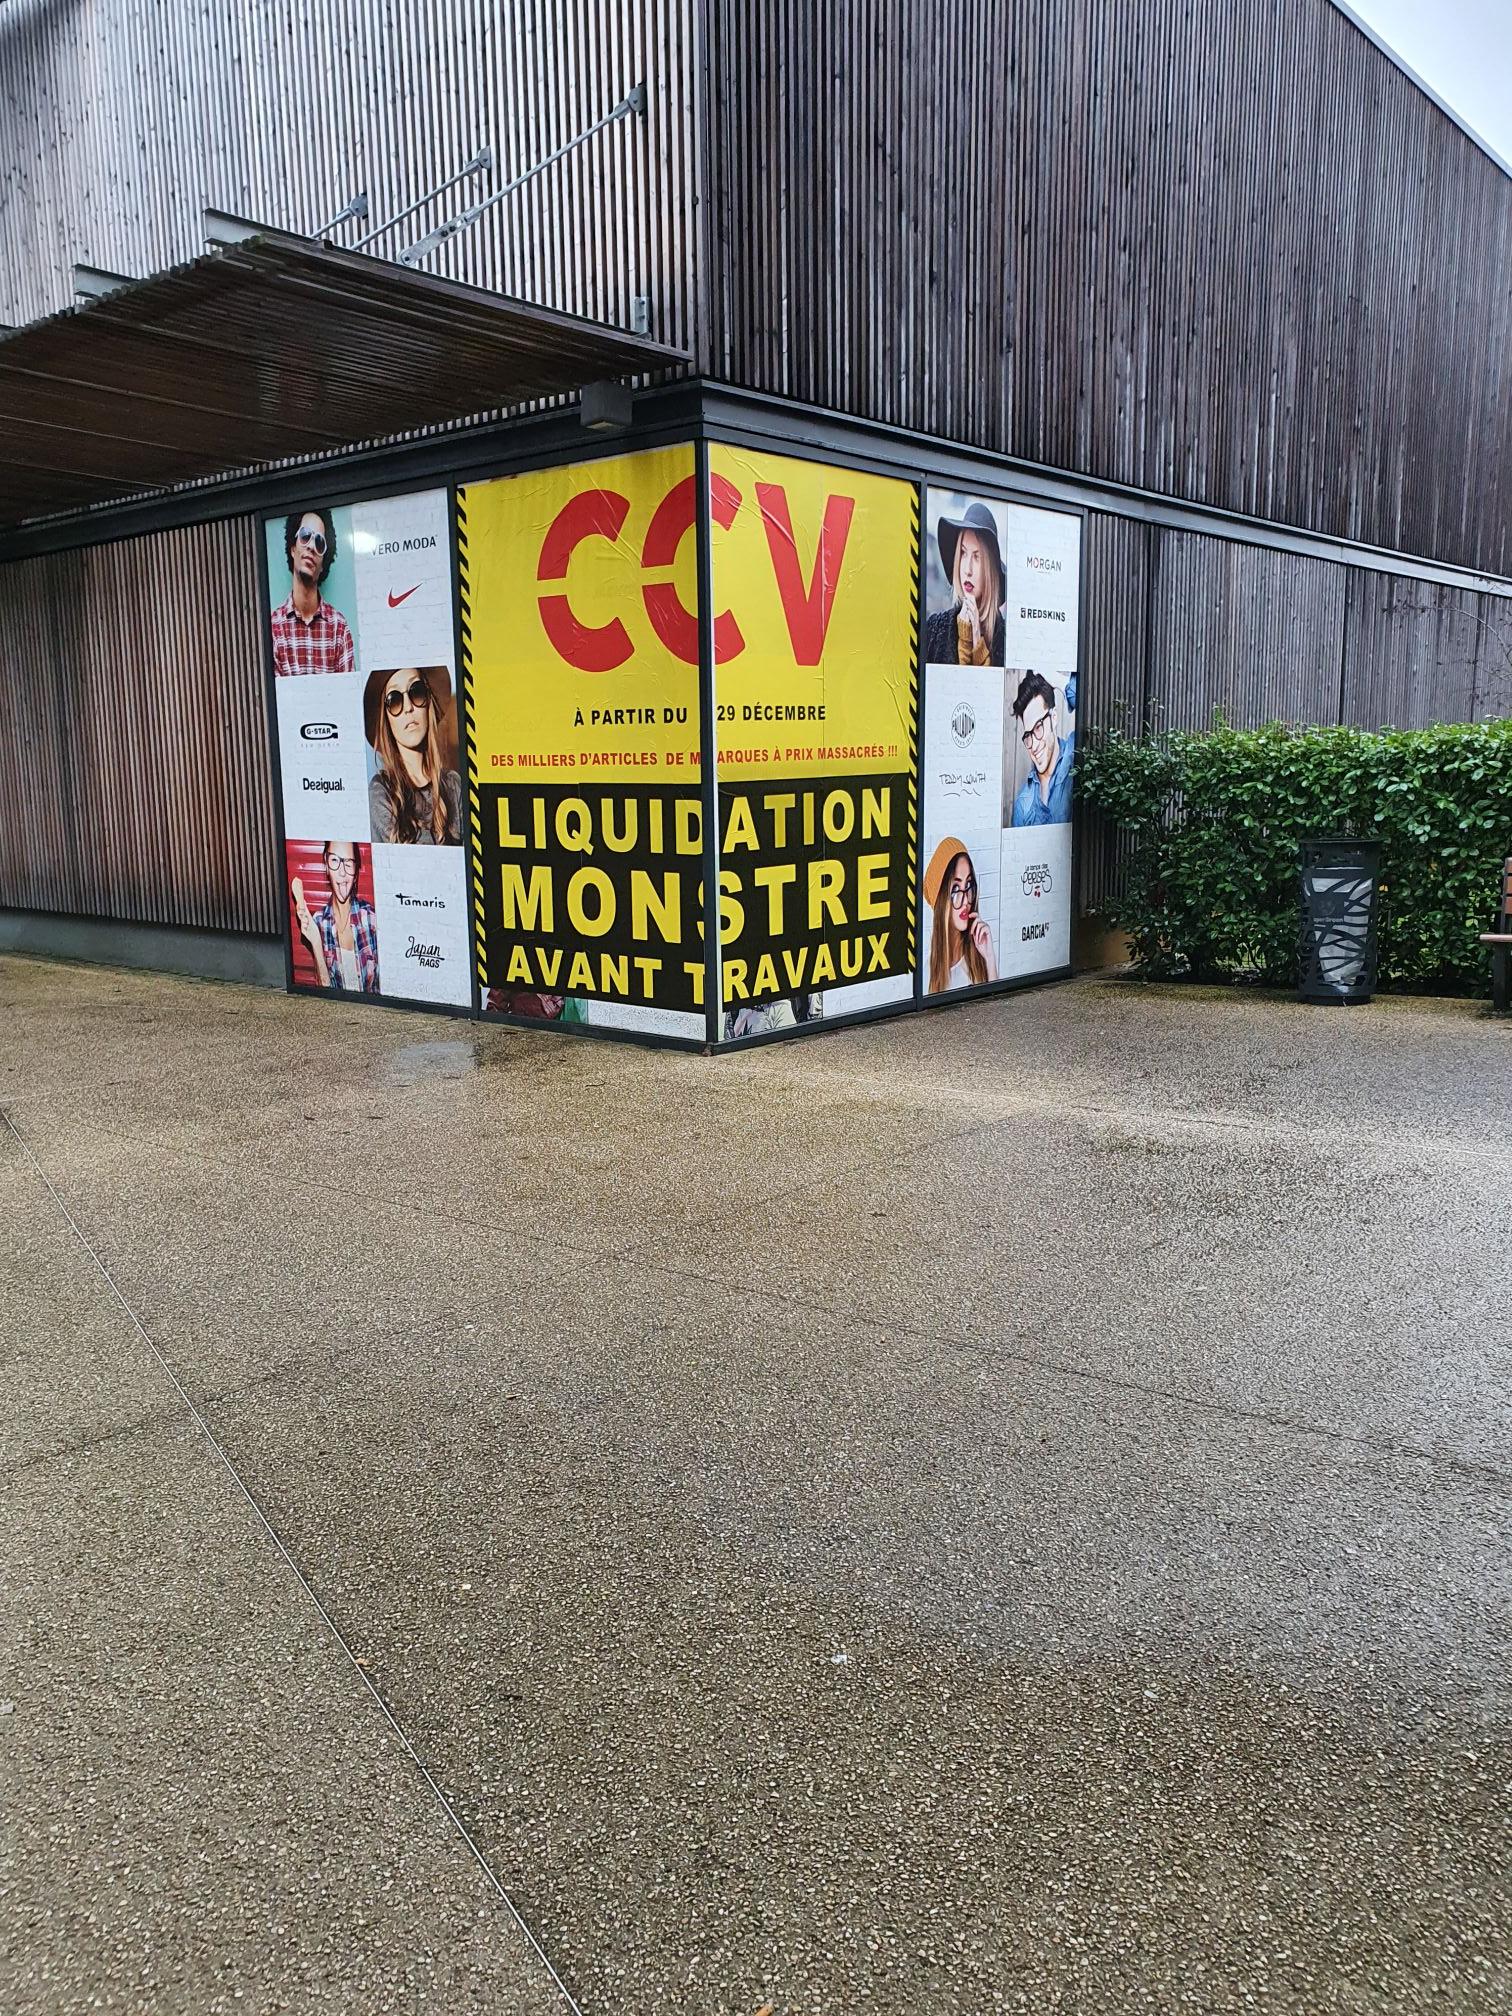 Liquidation totale avant travaux - C.C.V. Thionville (57)